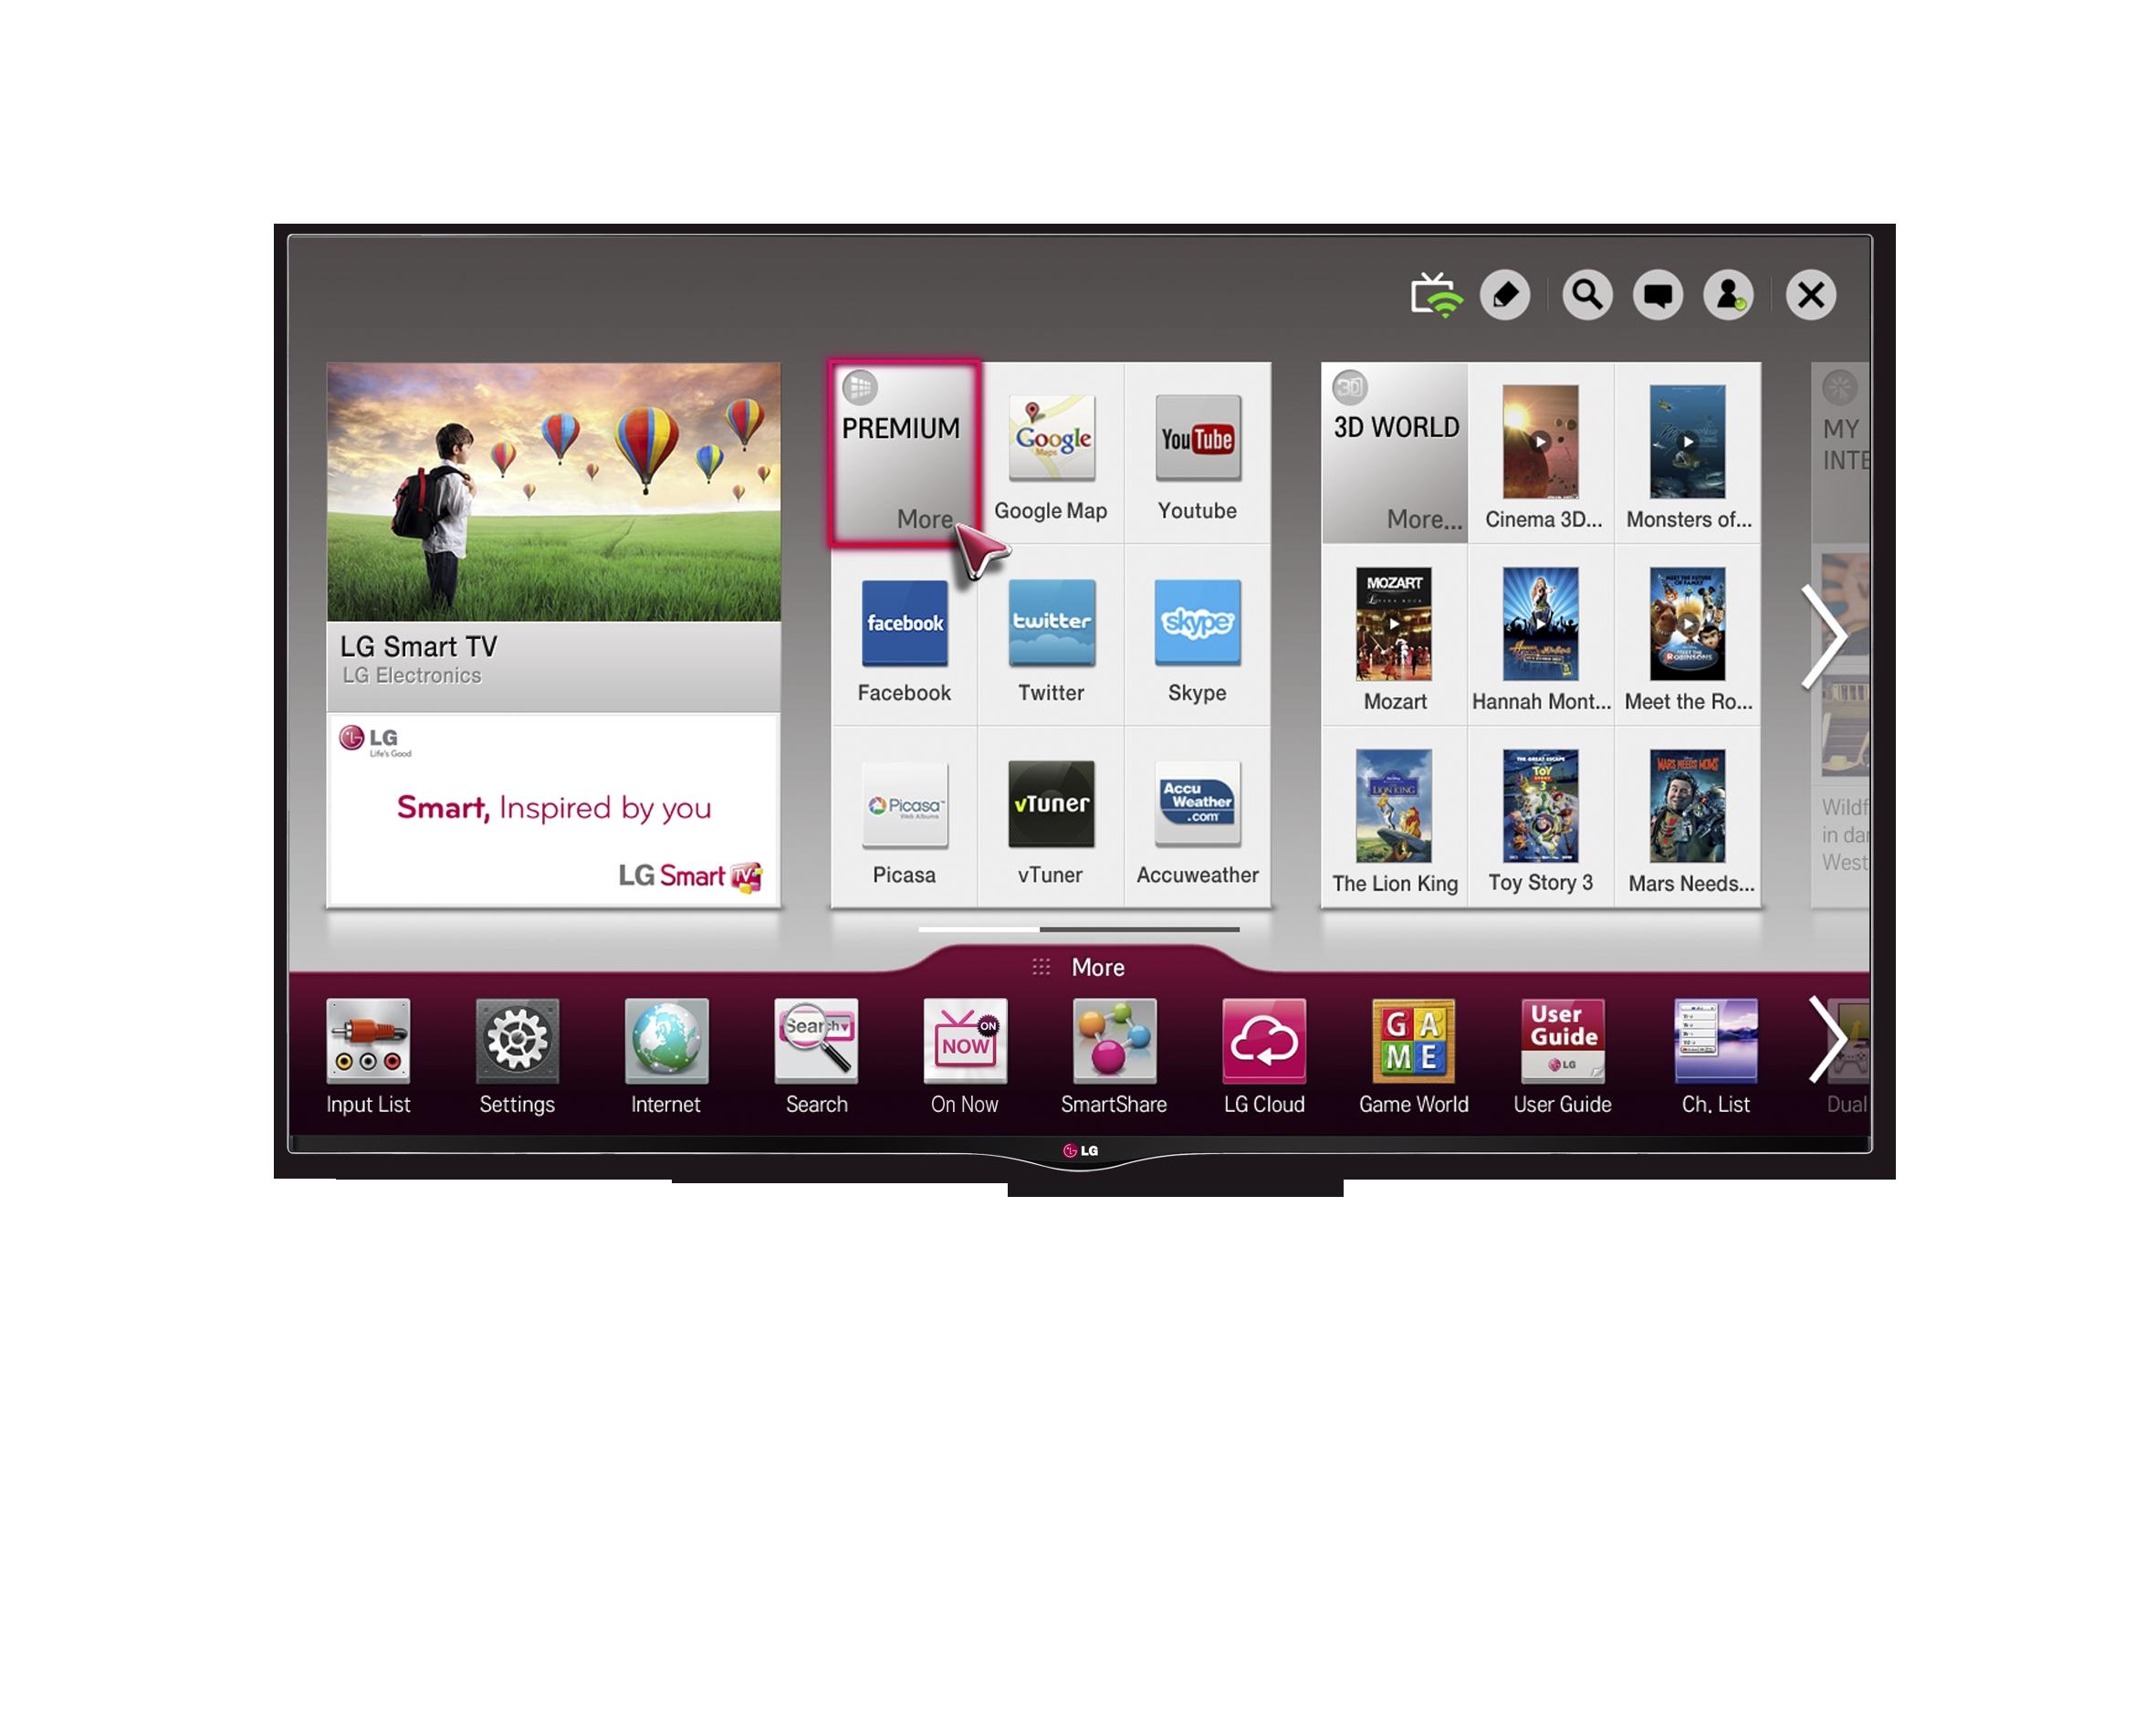 LG's new CINEMA 3D Smart TV displaying the Smart Home screen